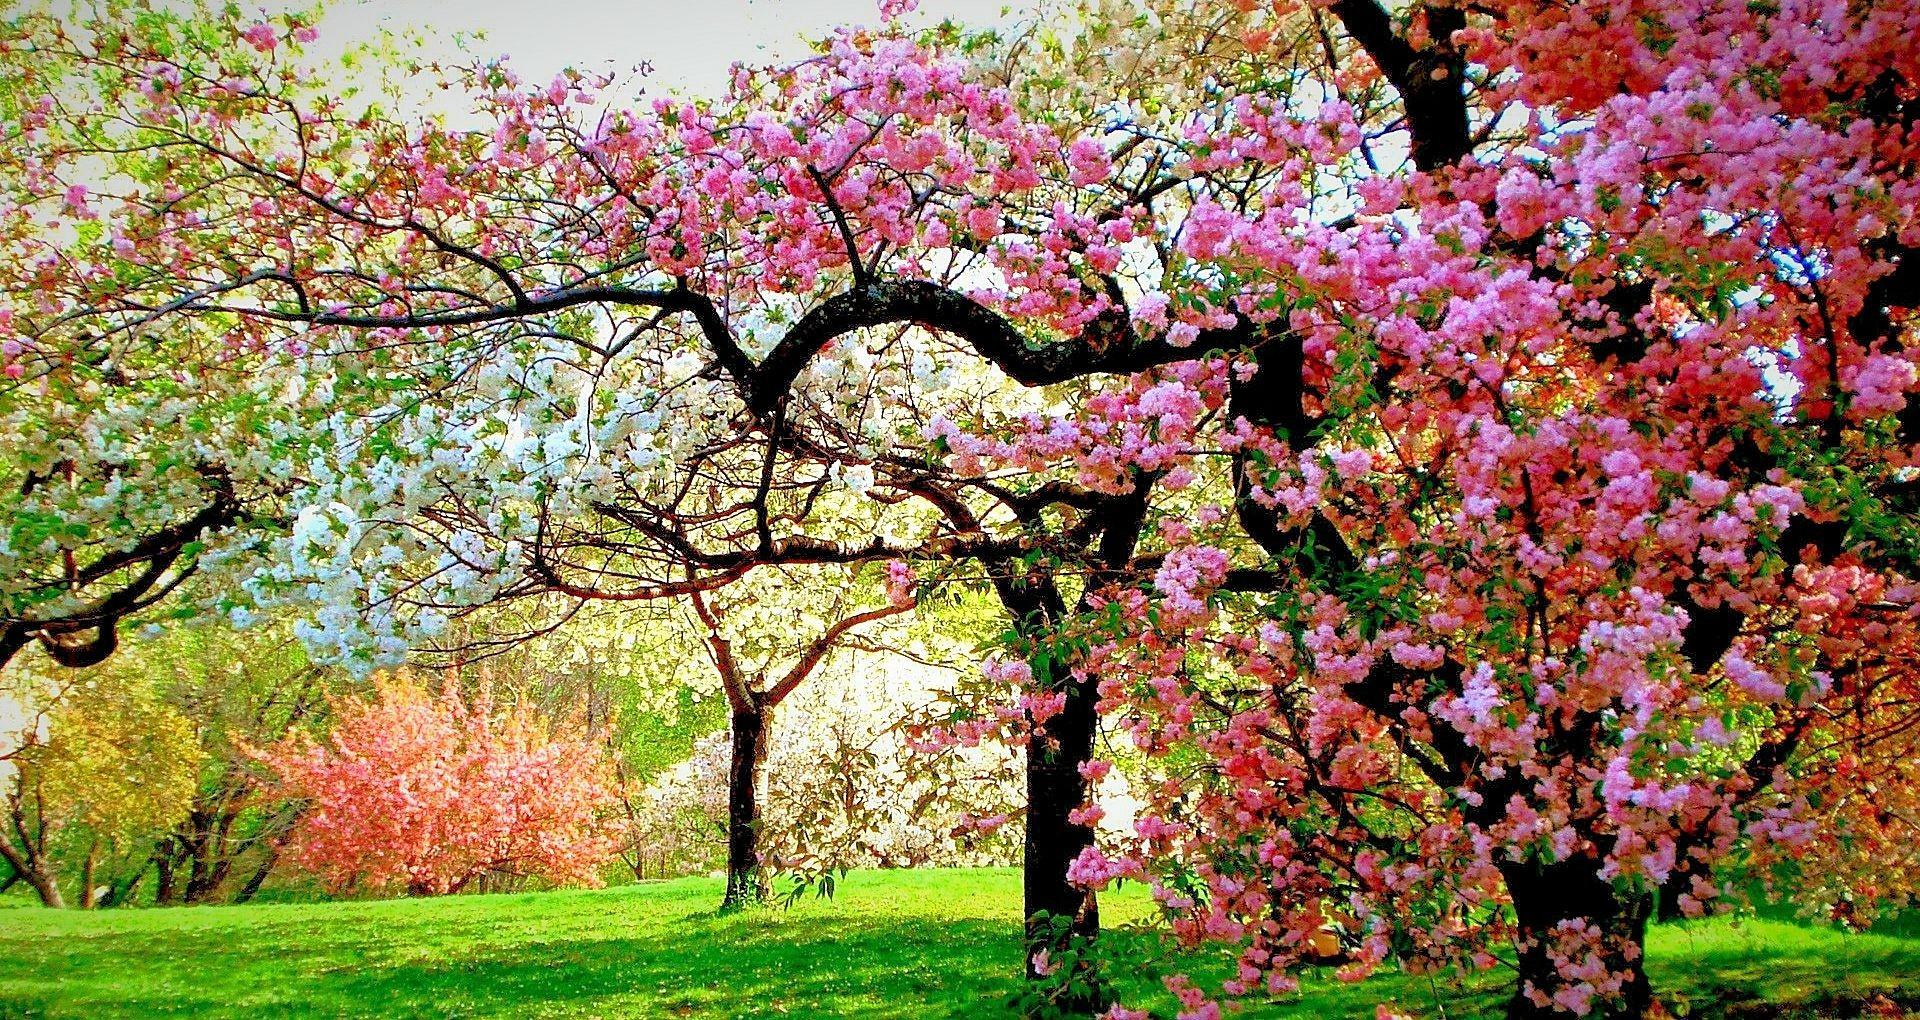 nature wallpaper full hd,tree,flower,plant,spring,blossom